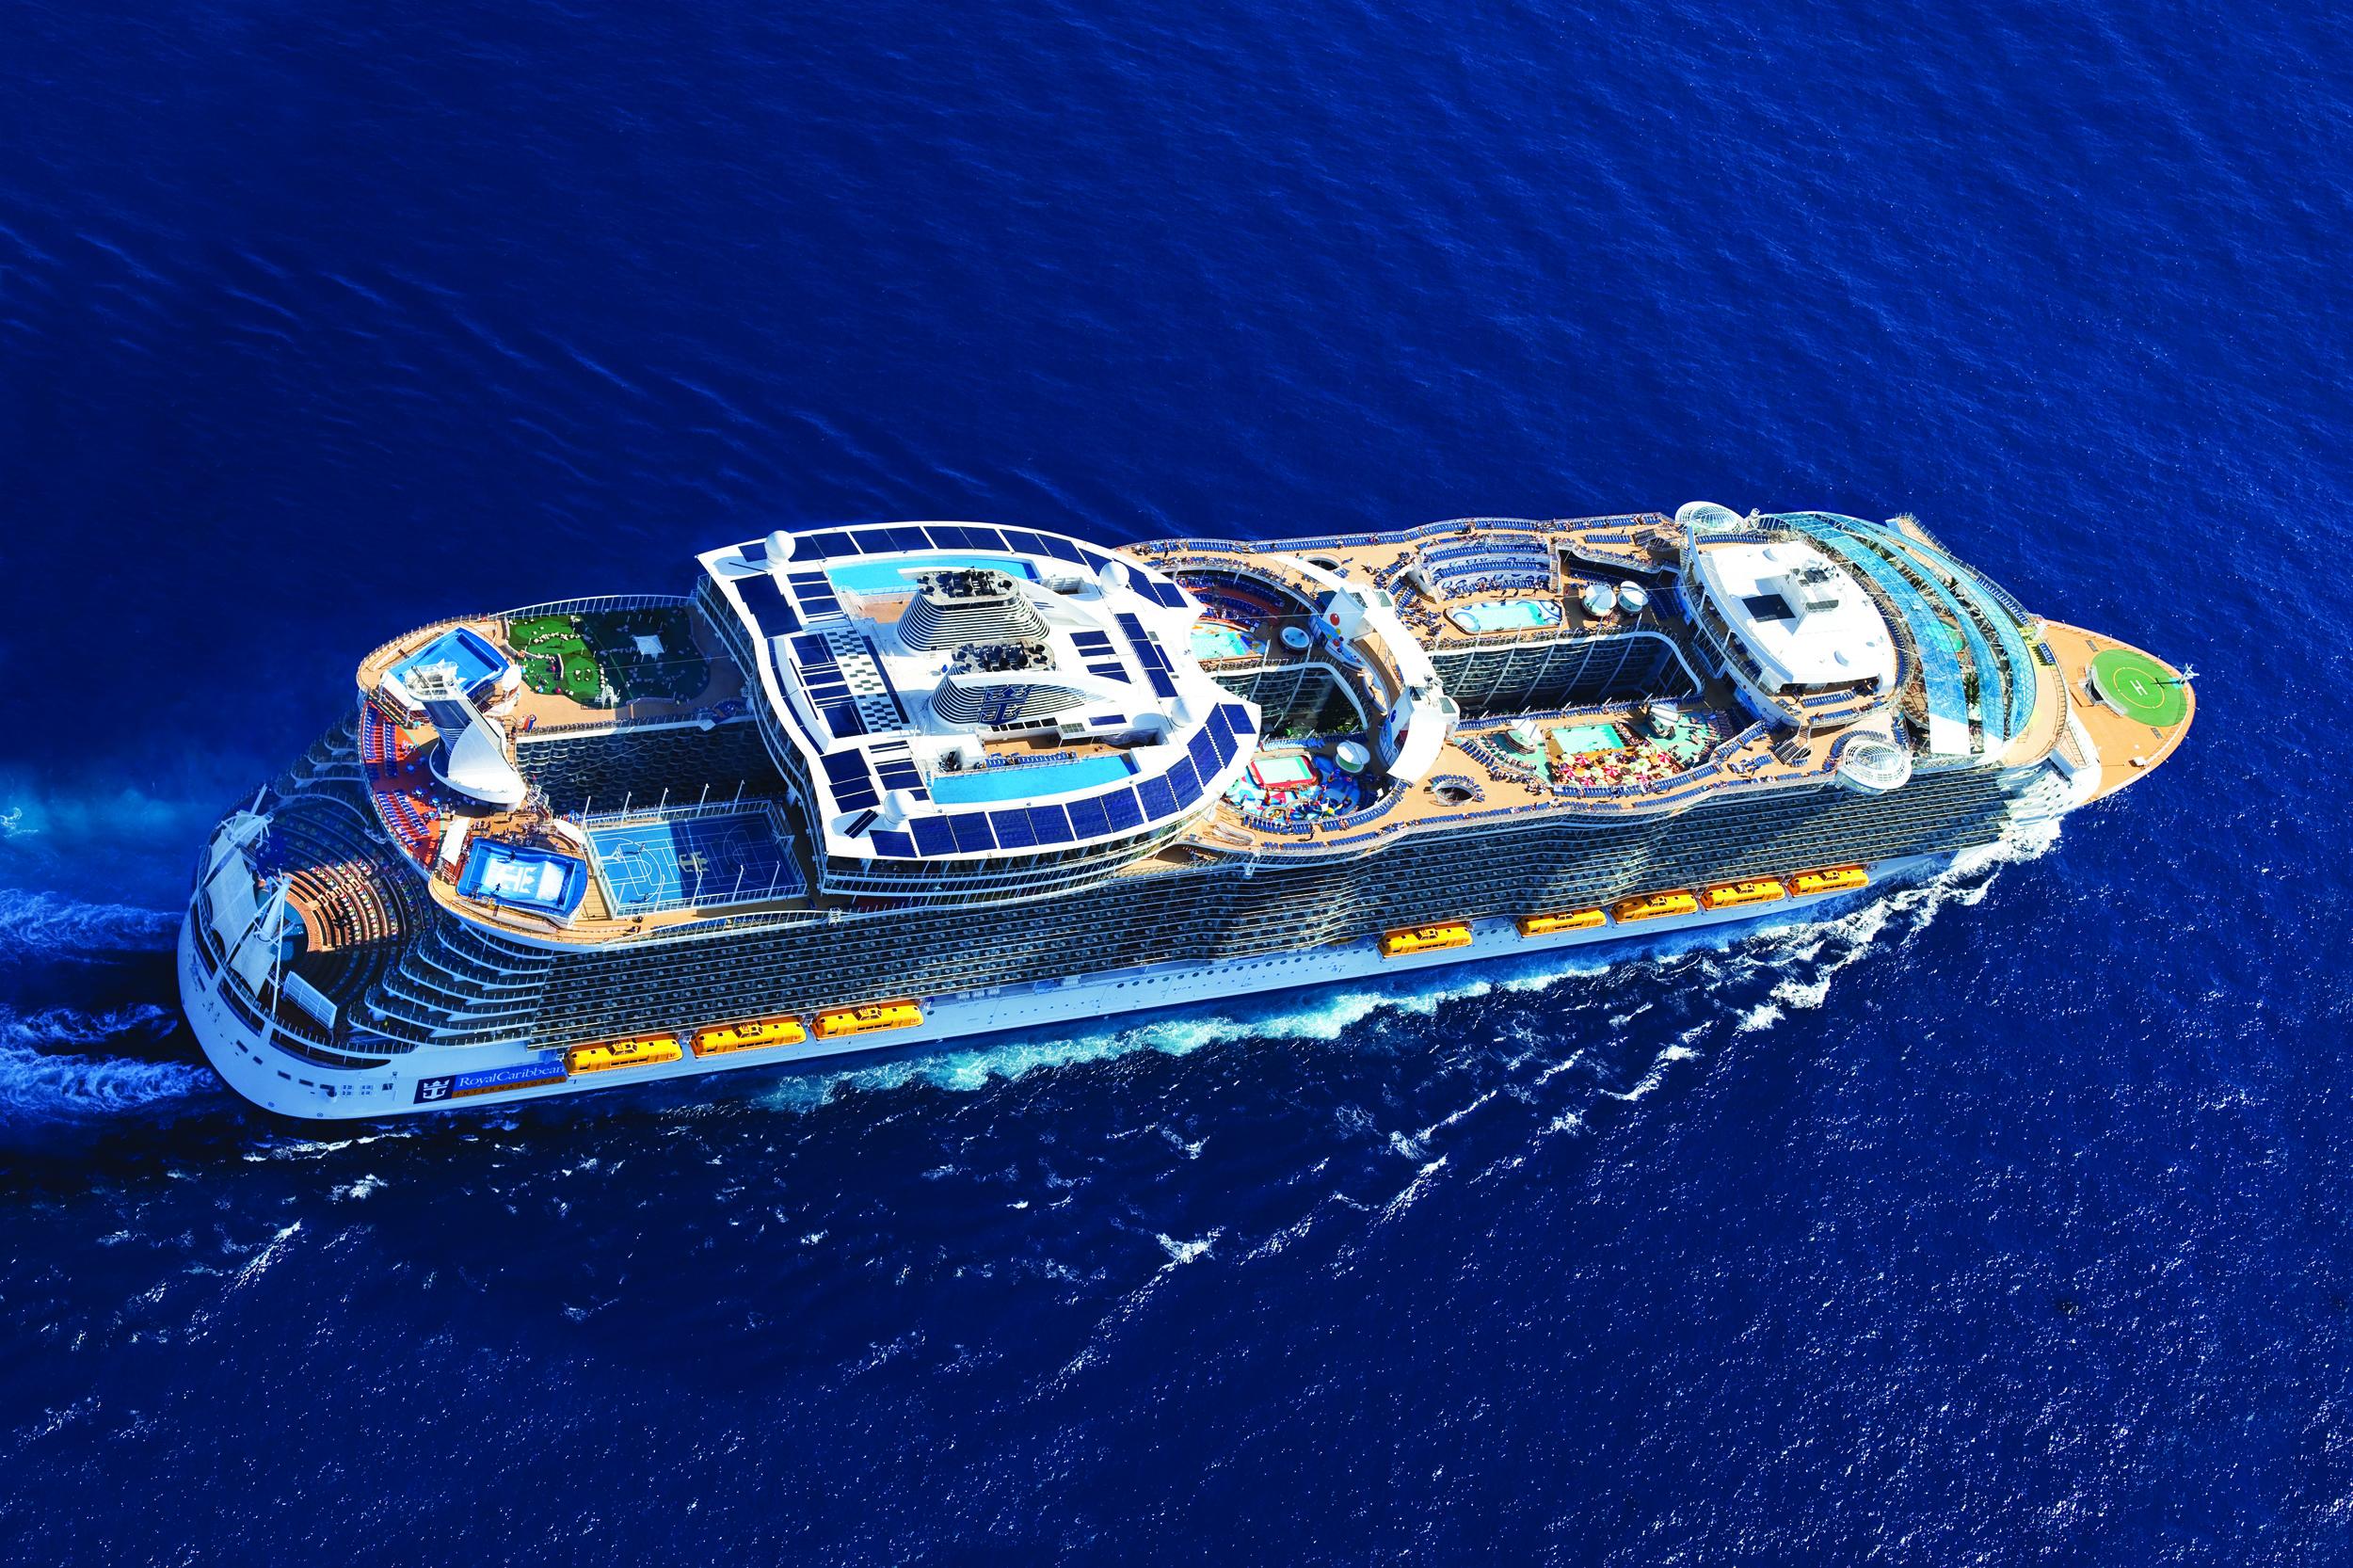 The Caribbean Cruise 2020